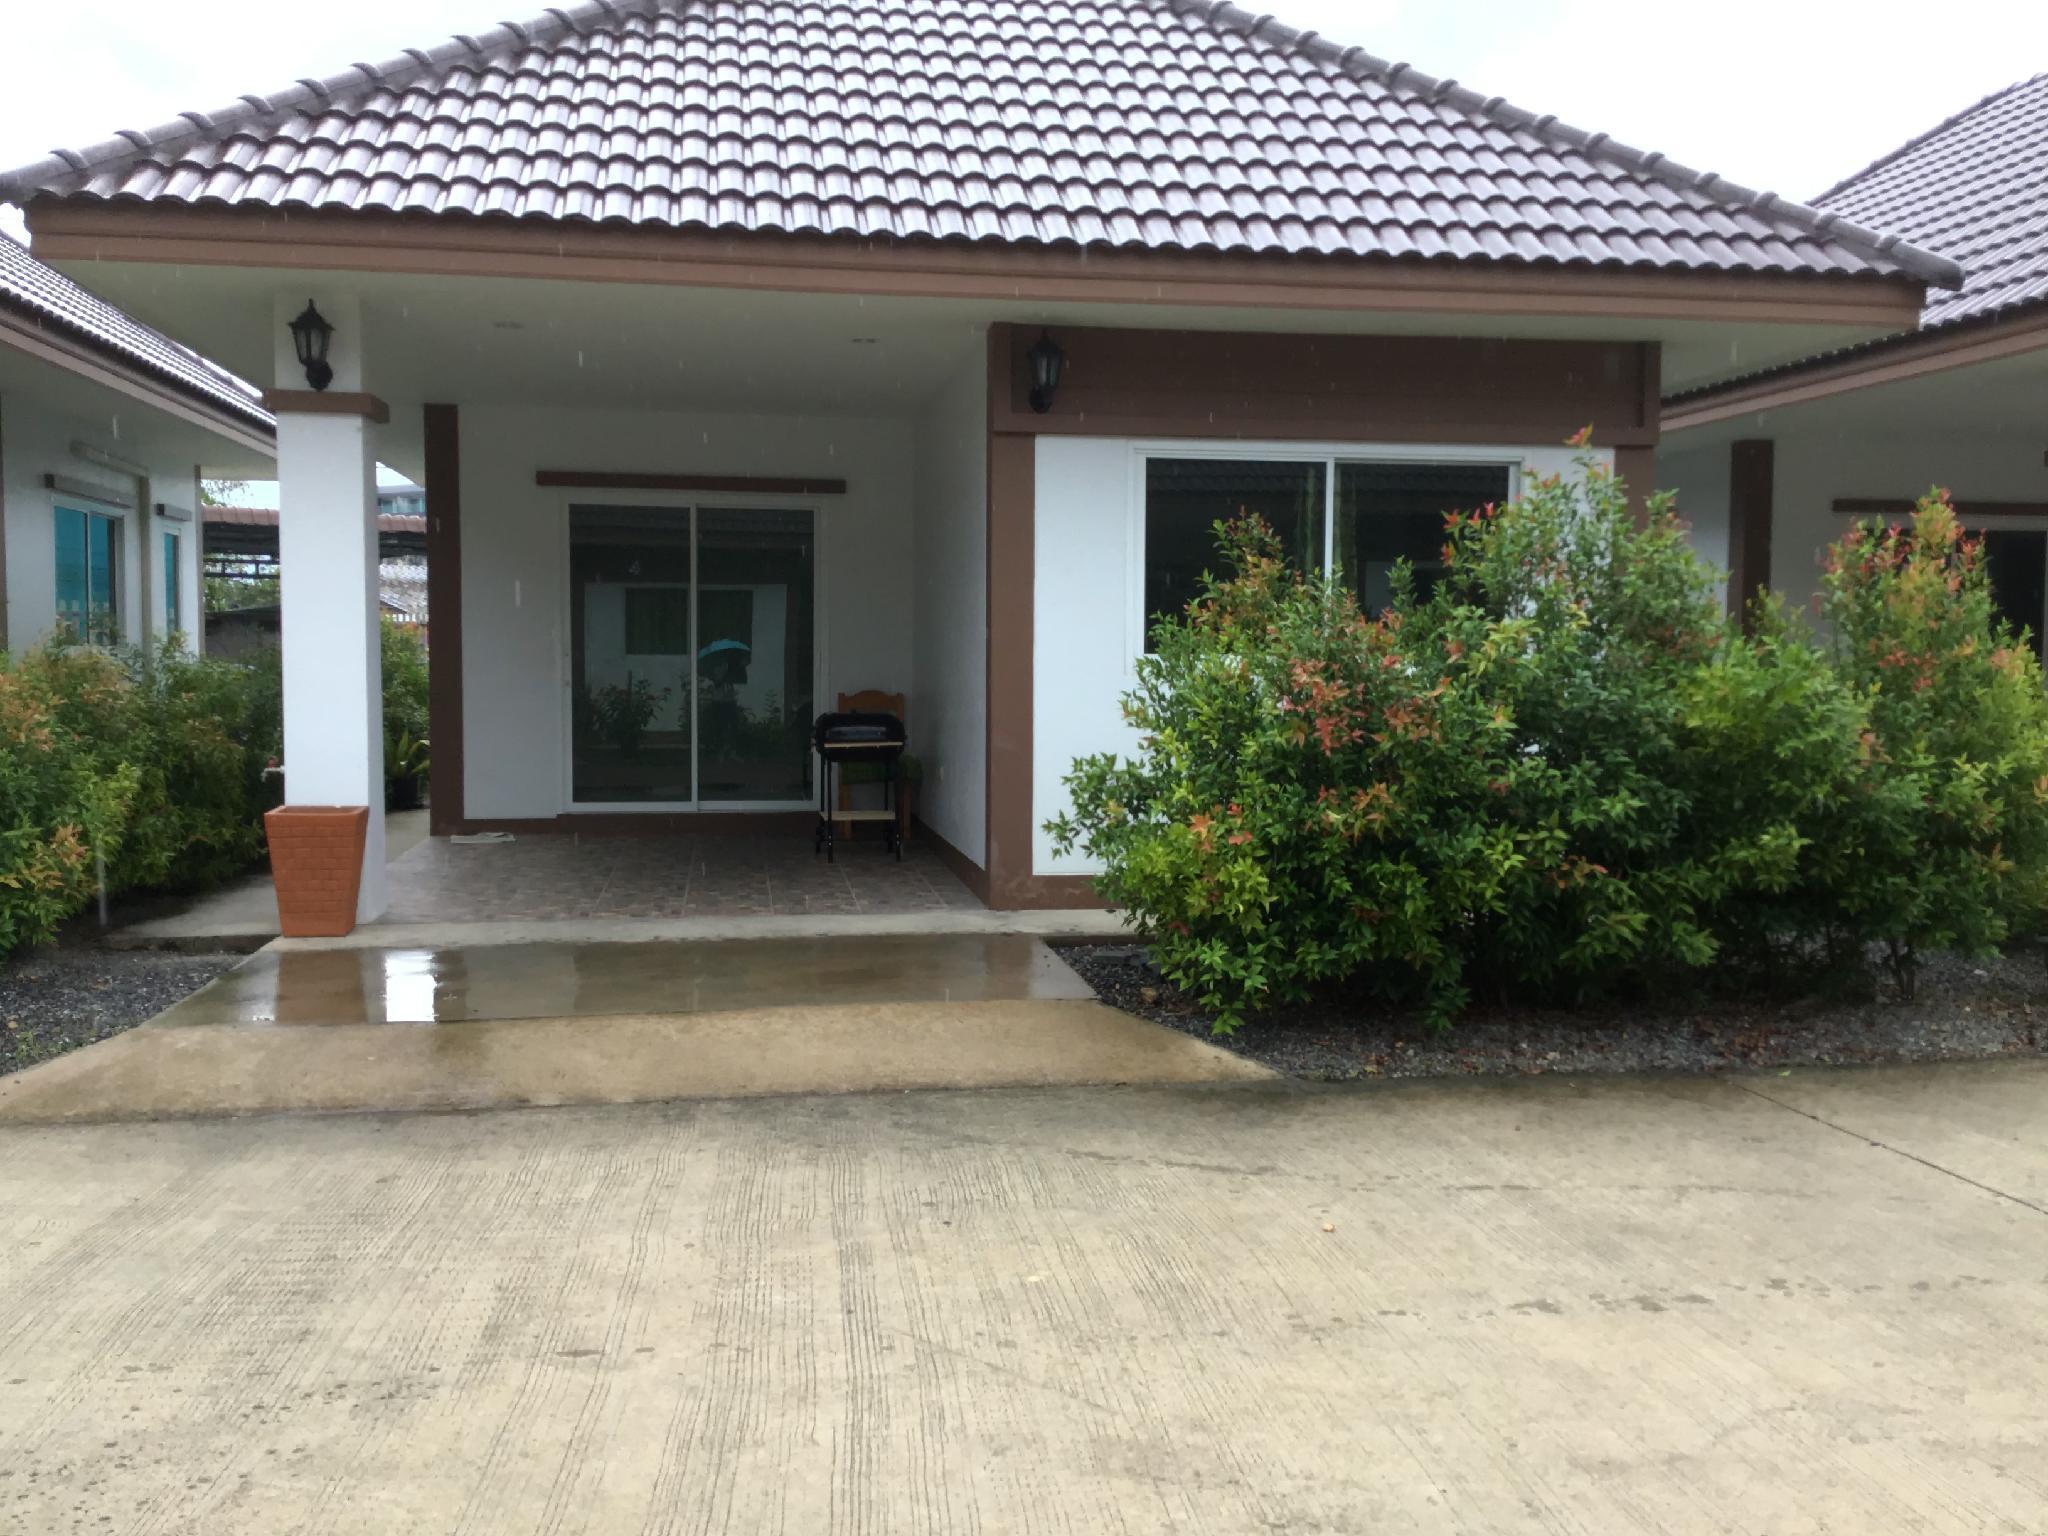 Bangsaray Greenery Home&Resort วิลลา 2 ห้องนอน 1 ห้องน้ำส่วนตัว ขนาด 48 ตร.ม. – พัทยาเหนือ